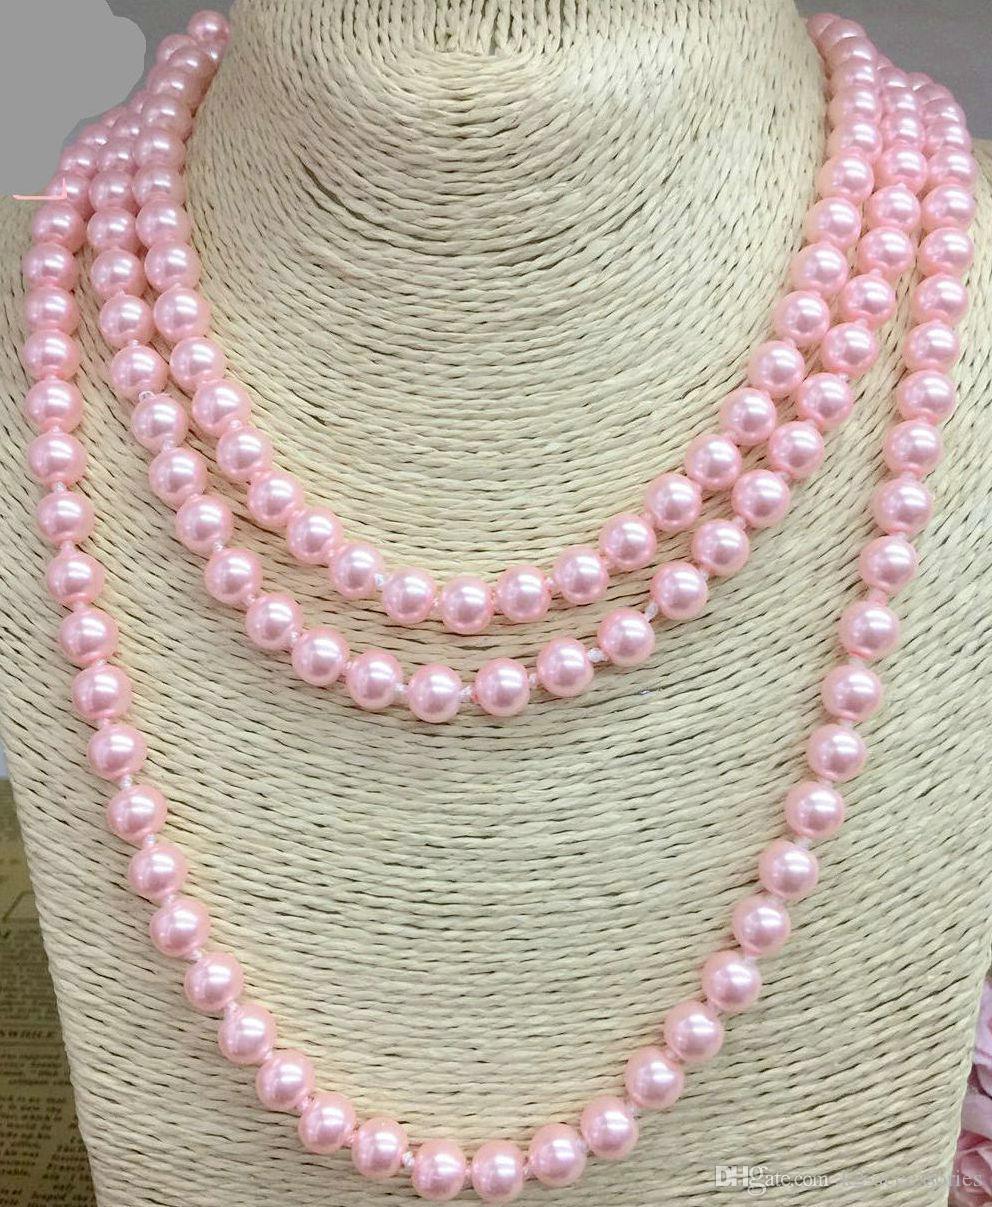 Single Long Strand 8MM Imitación de perlas de imitación HANDCRAFT KNOTTED Collar Joyería Regalo Moda Mujeres Cadena Joyería fina para mujeres